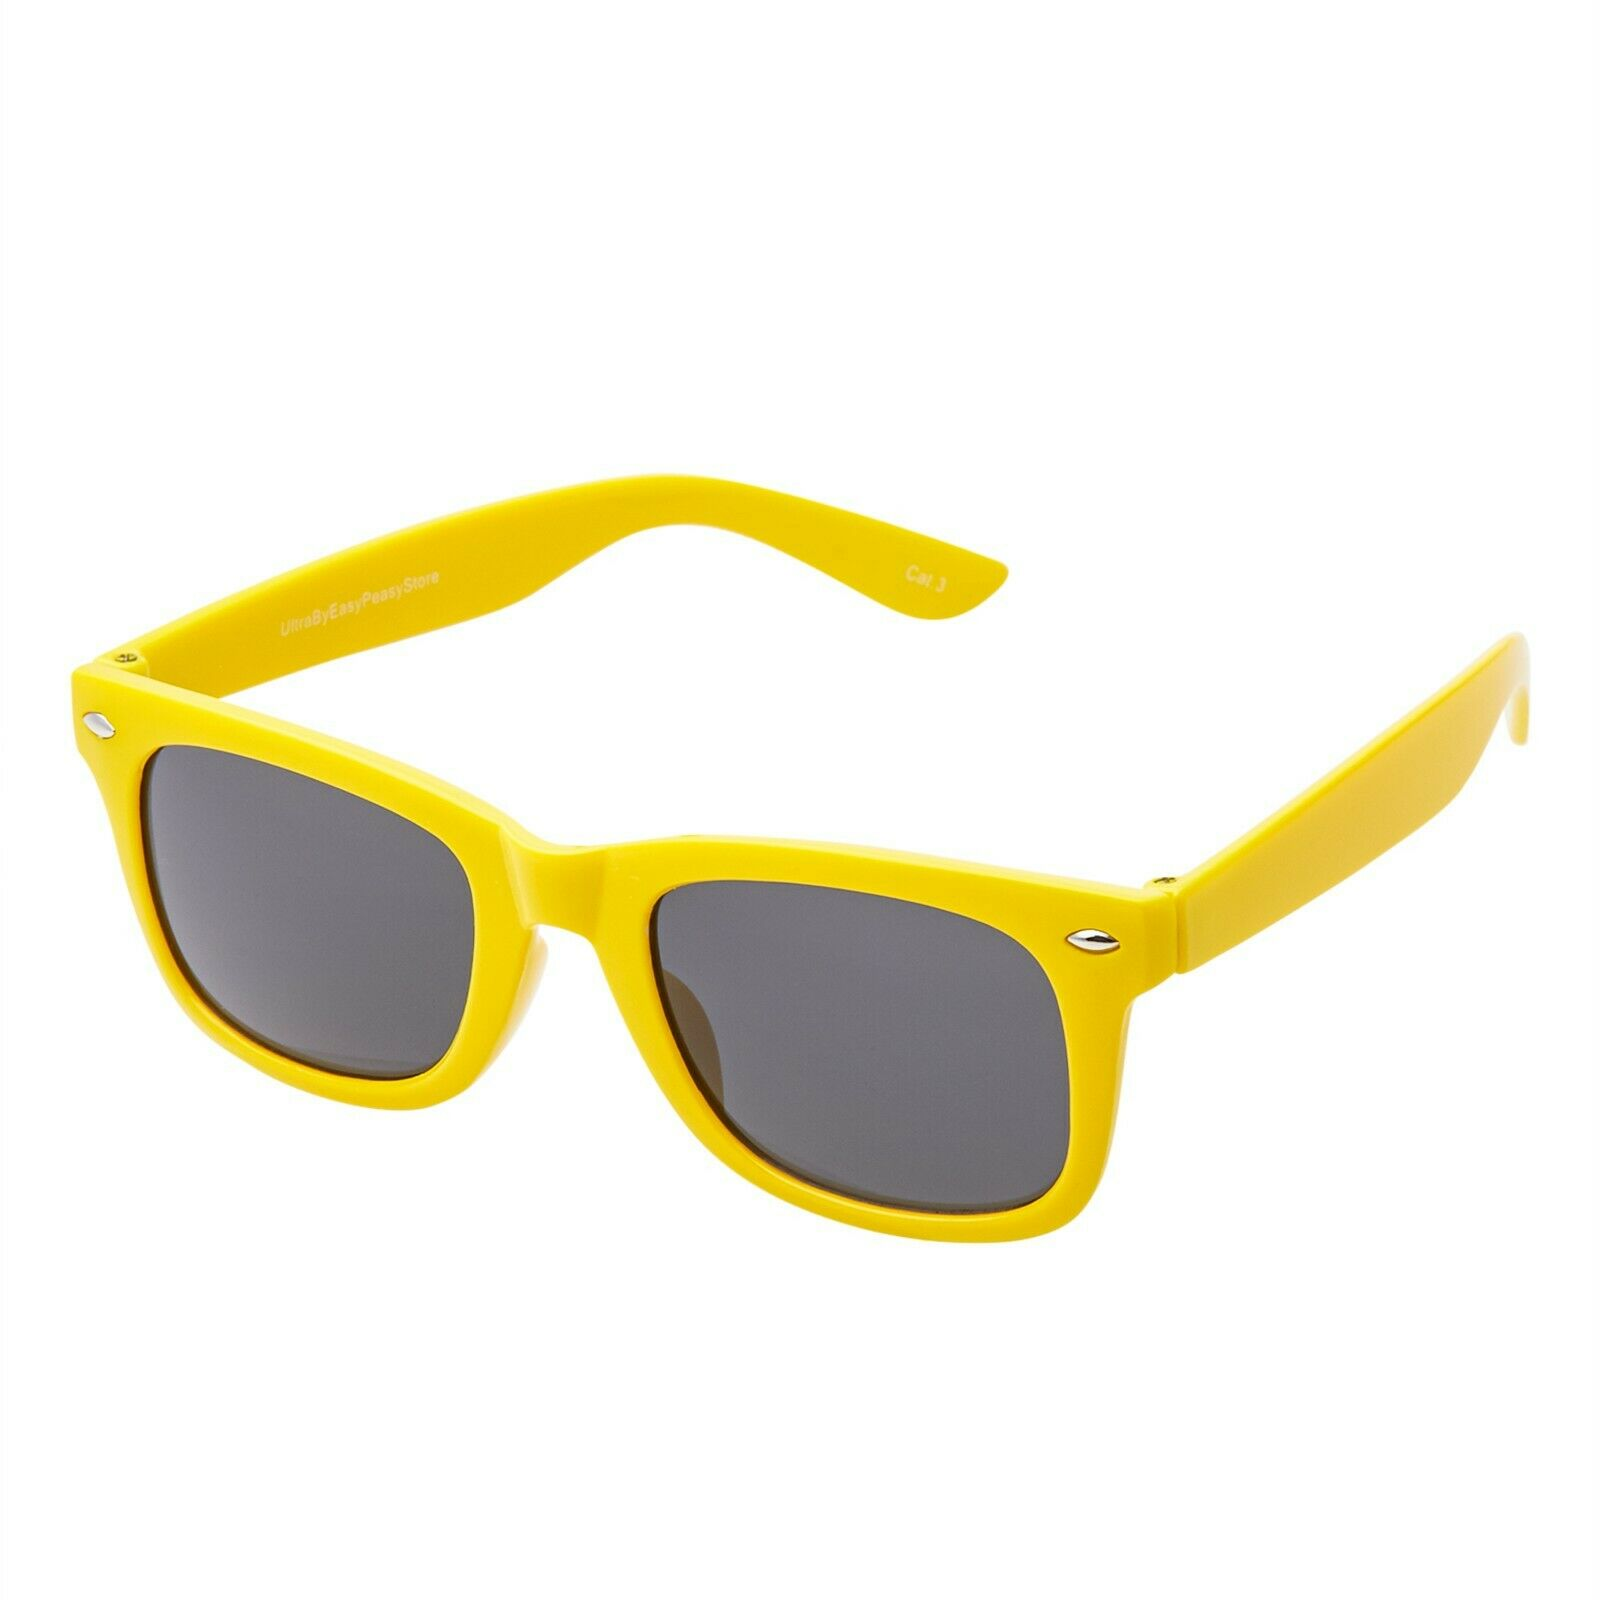 Yellow Kids Childrens Sunglasses Girls Boys Classic Shades Fashion Glasses Uv400 714983455251 Ebay